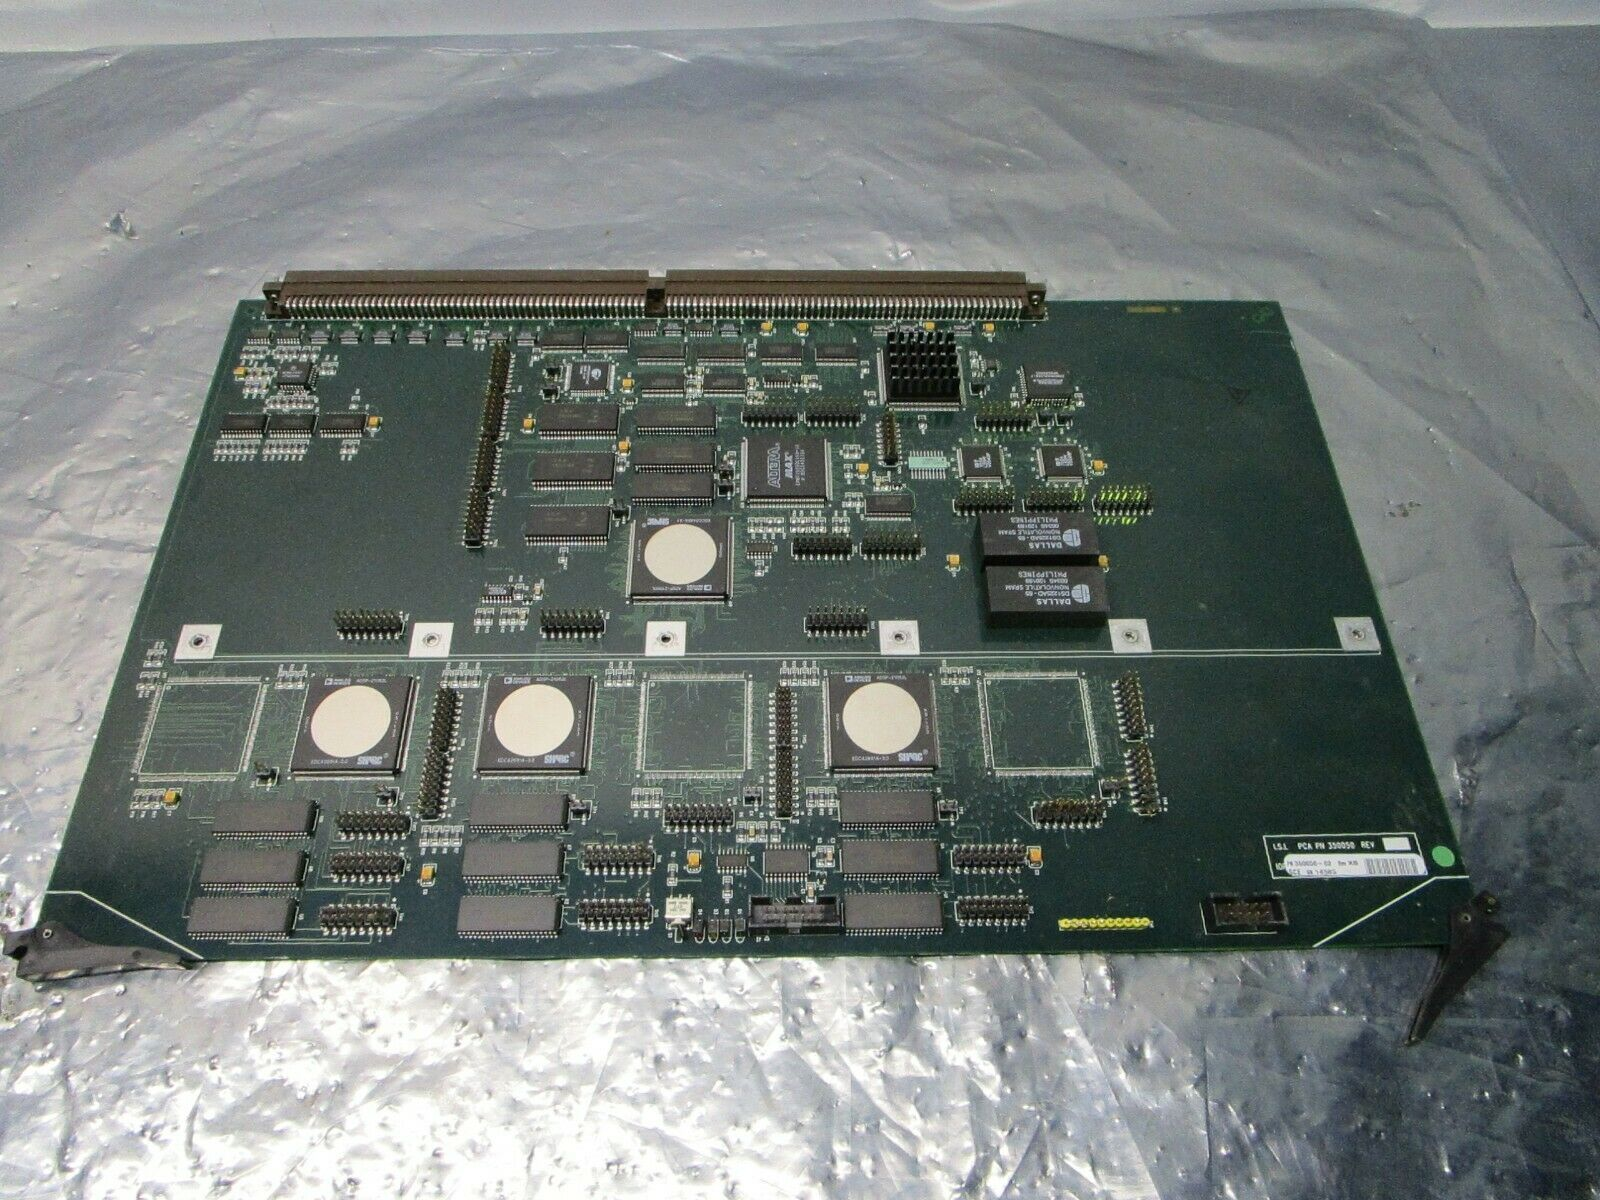 I.S.I. 350050-02 PCA Board, 350050, PCB 350055, 101224